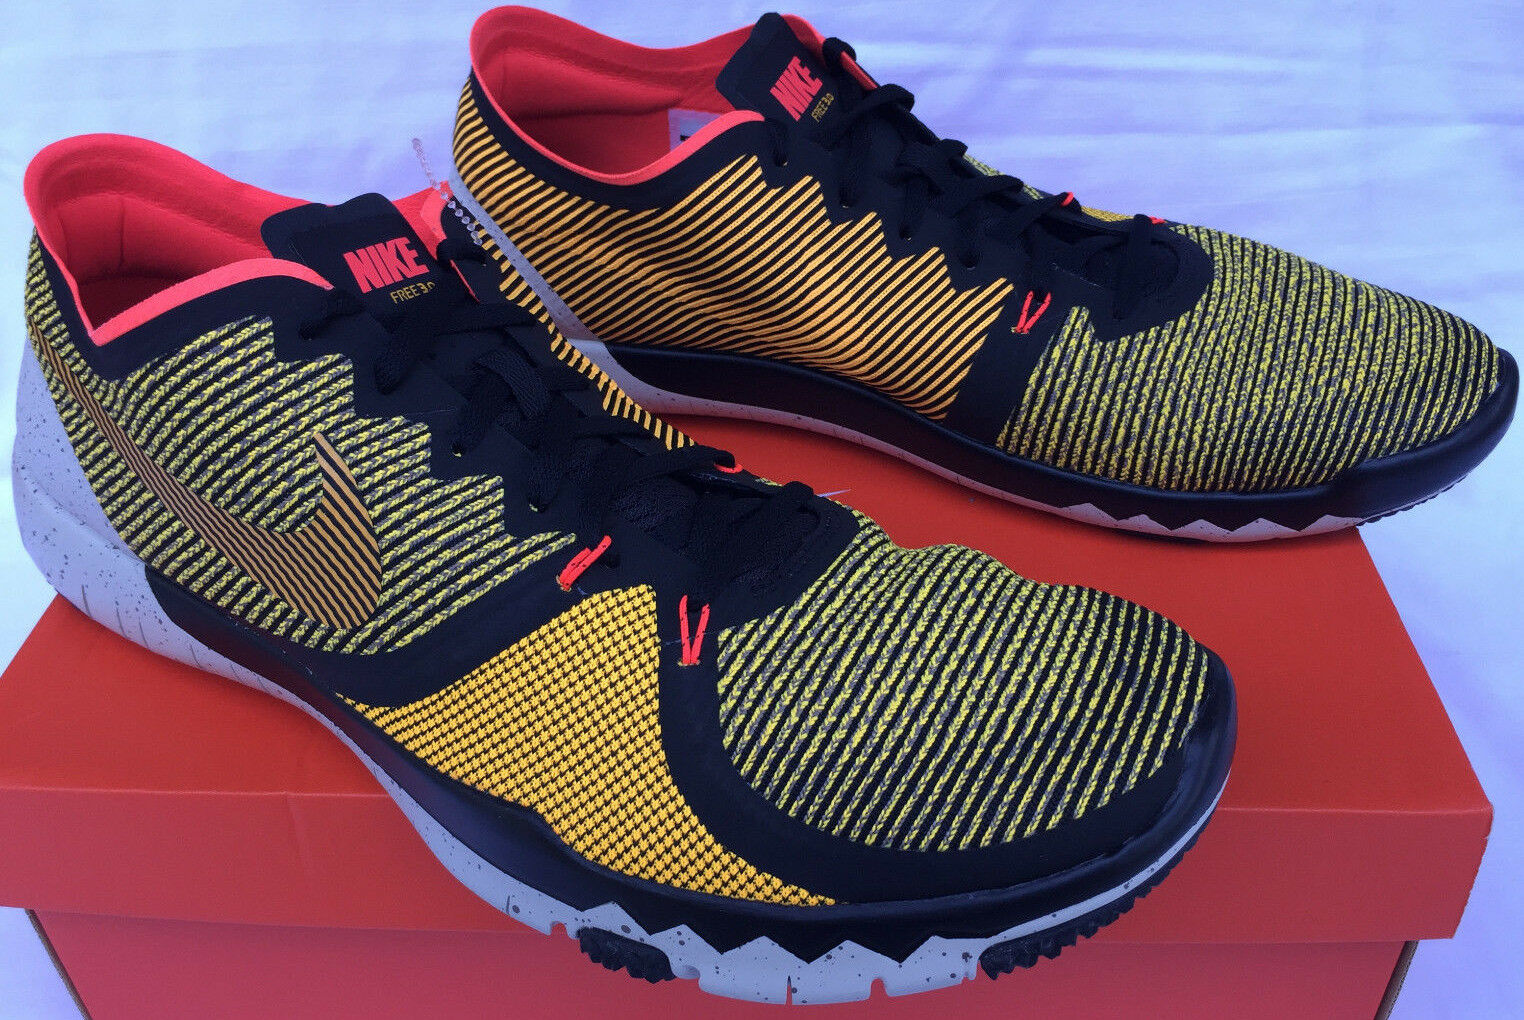 Nike Free Trainer 3.0 V4 AMP 749374-800 Lazer Marathon Running Shoes Men's 14